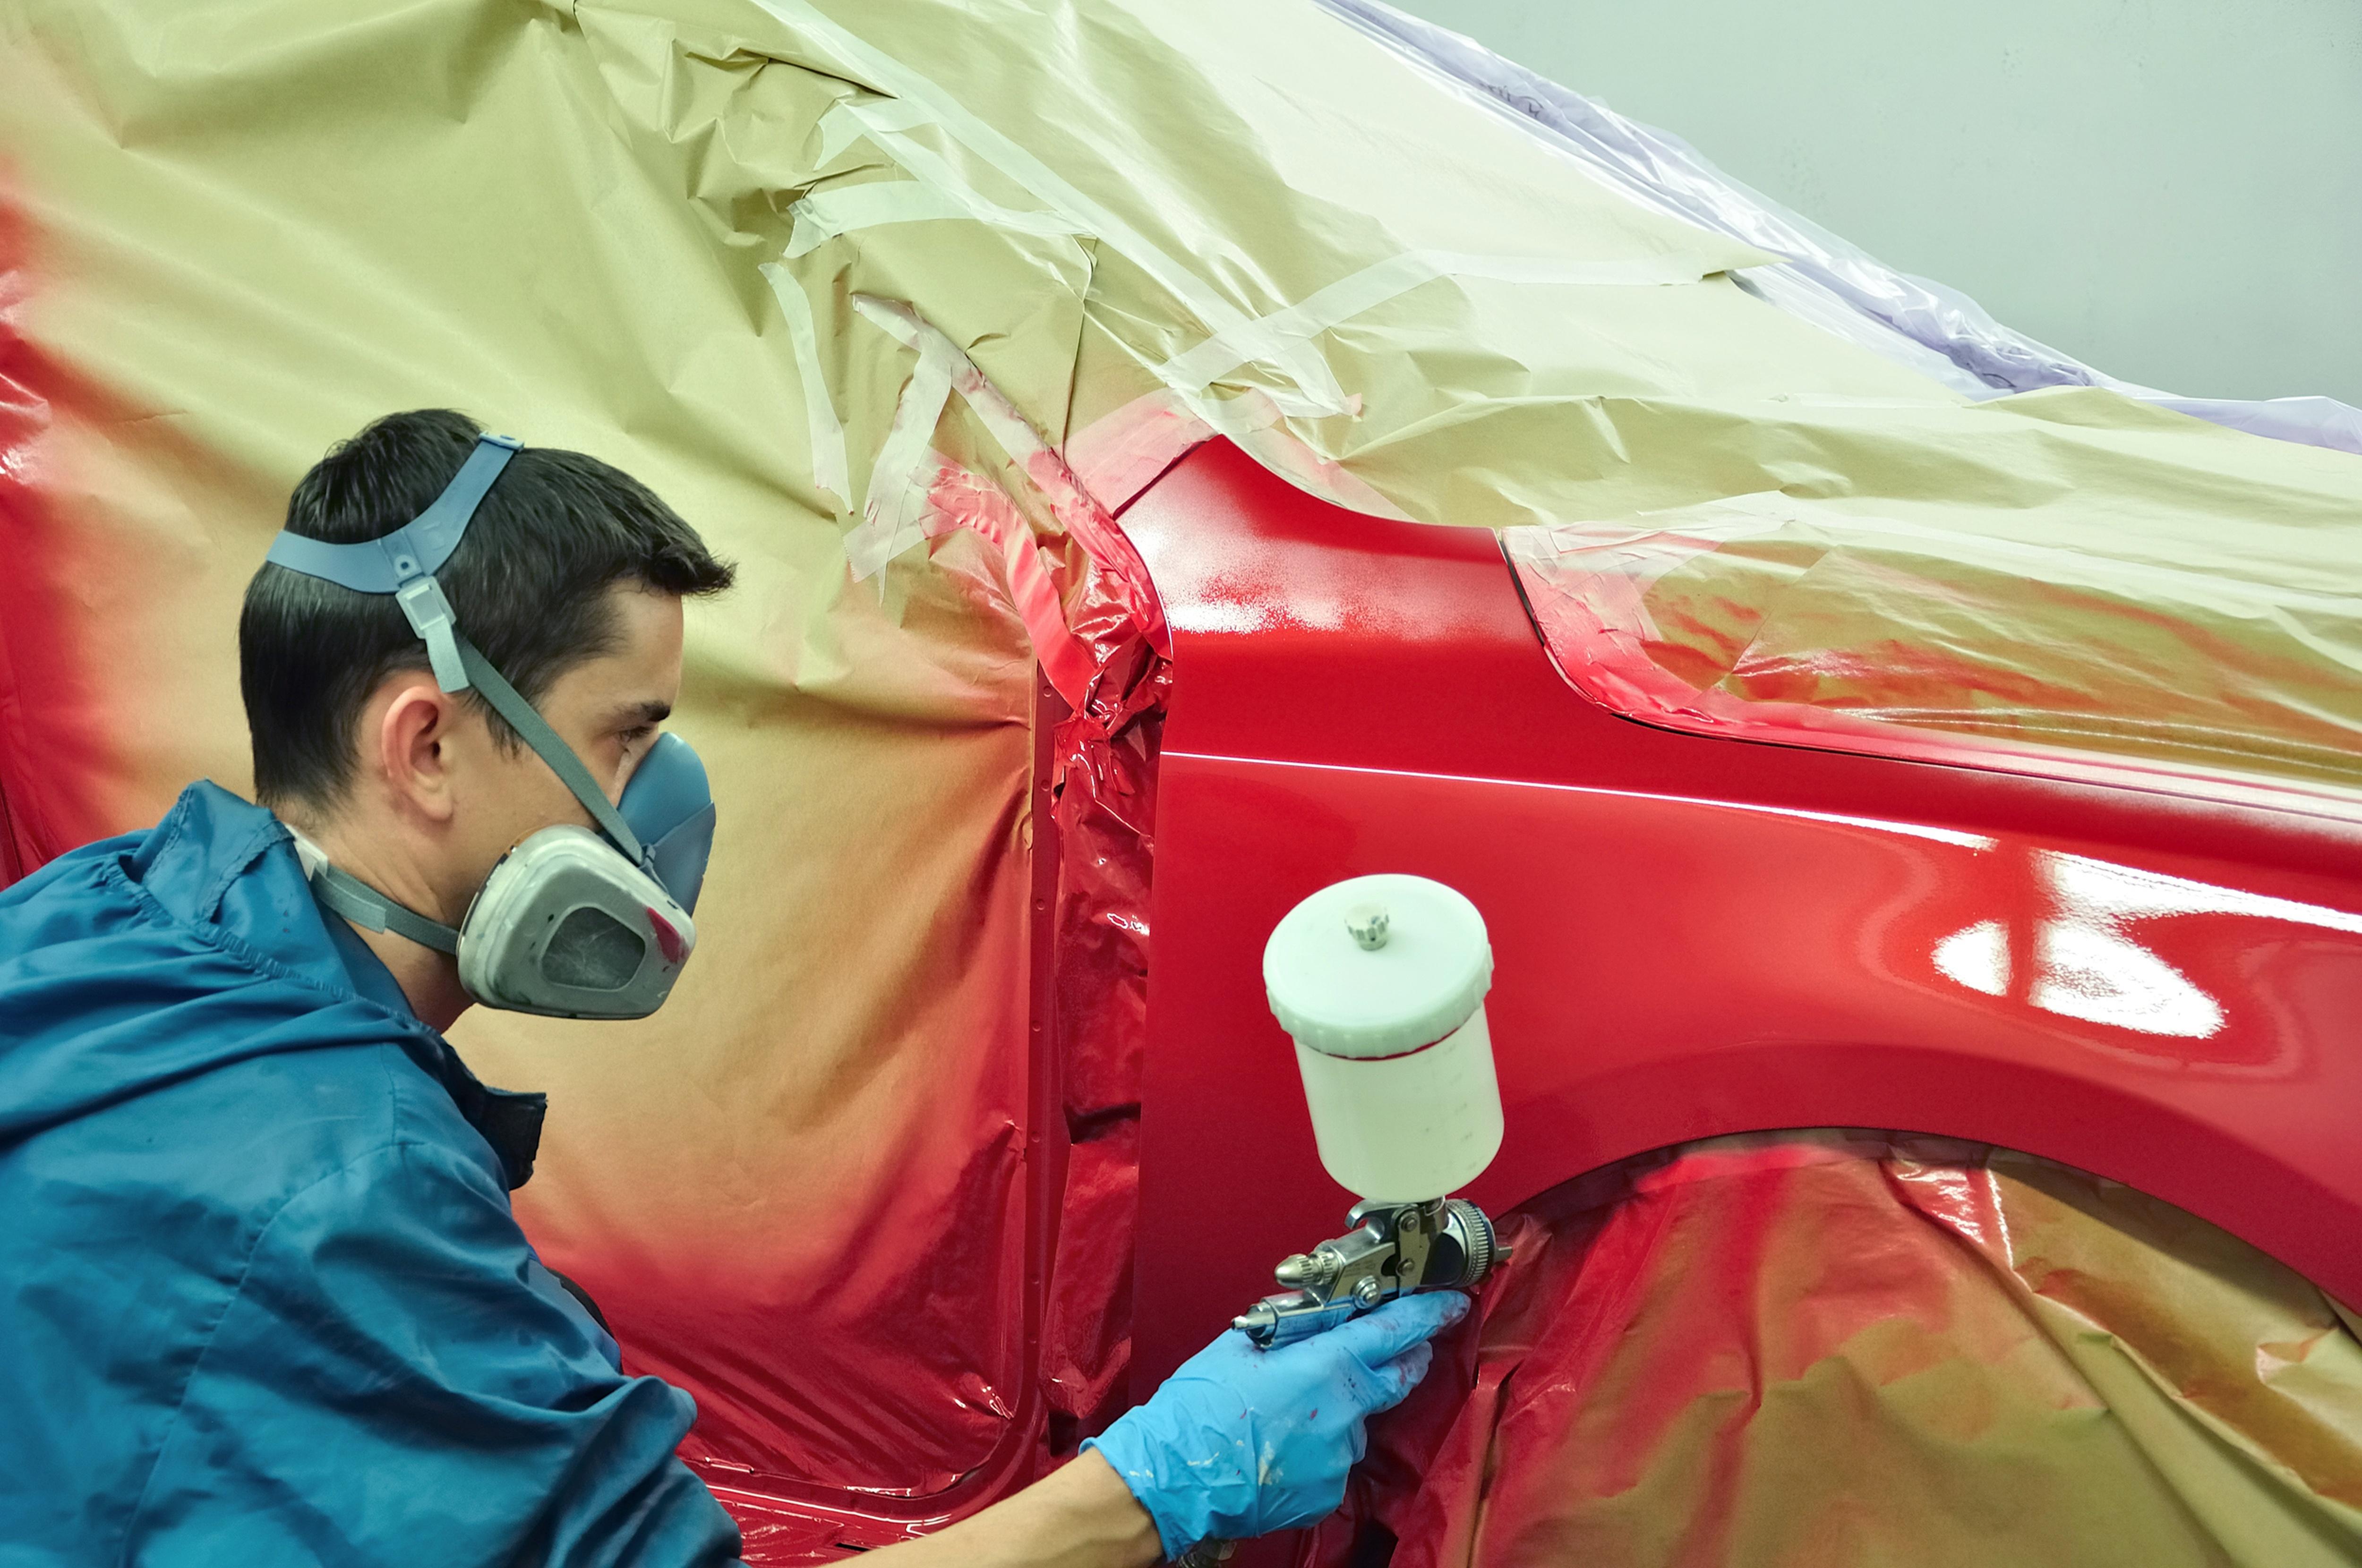 Spray Booth worker using an aerosol paint applicator.